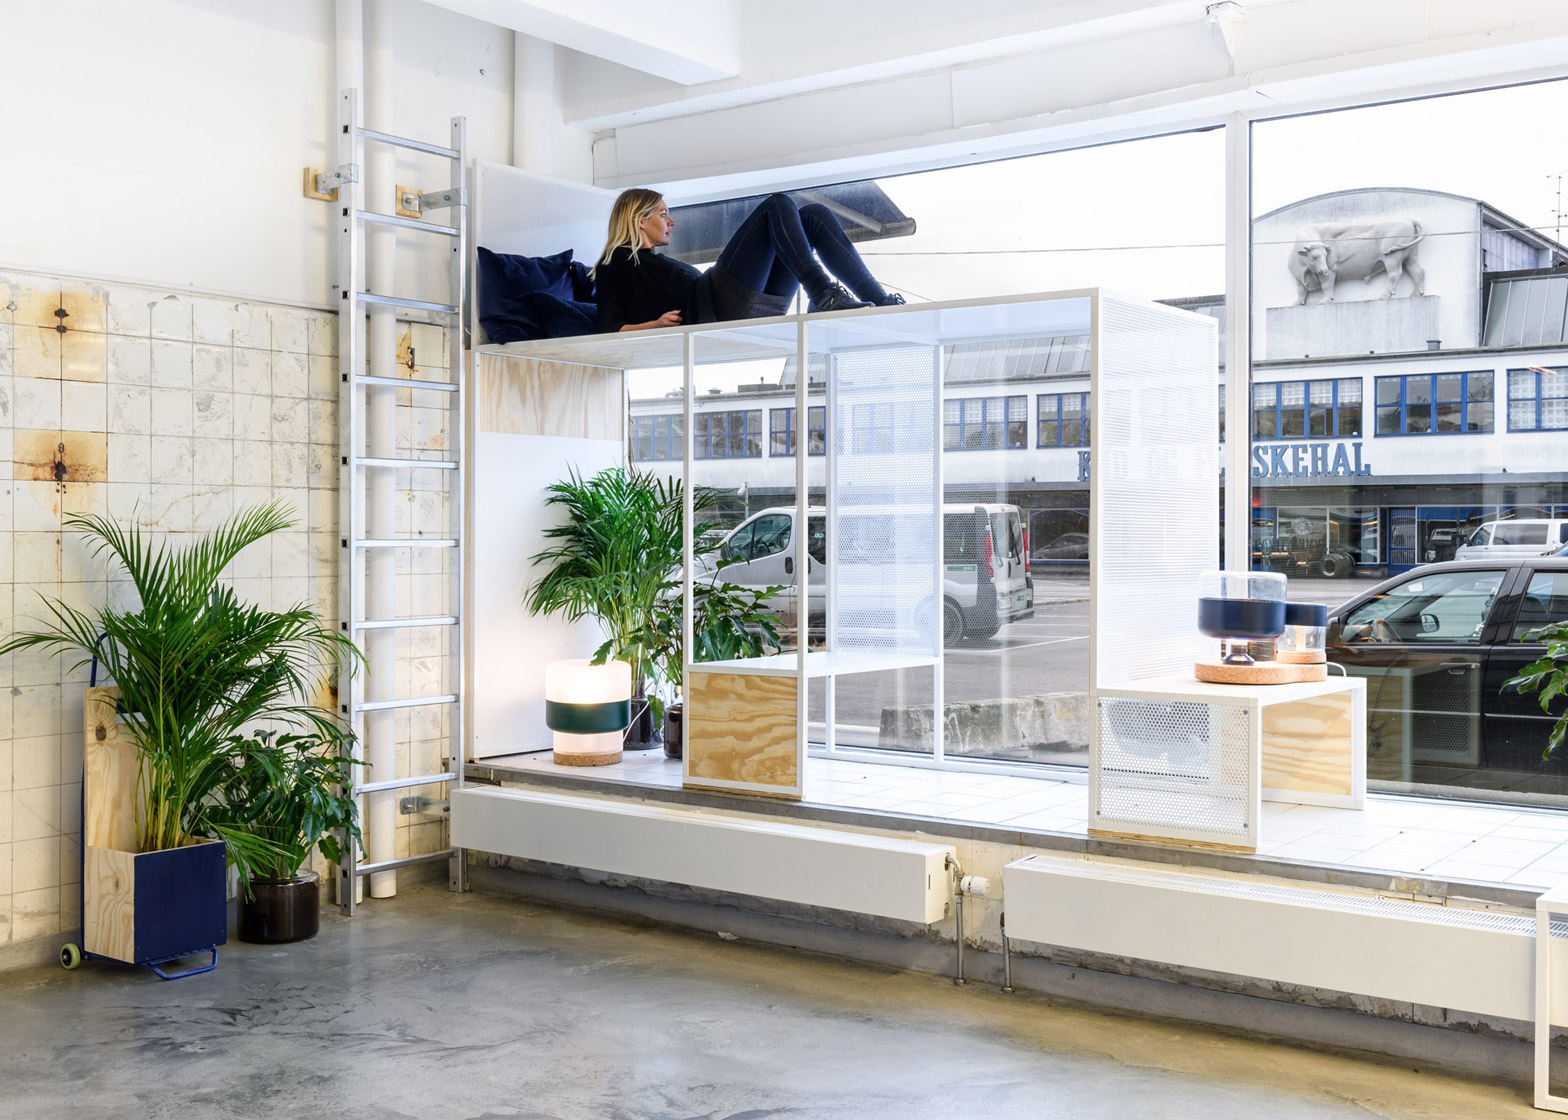 Ikea-Space-10-Innovation-Lab_Alastair-Philip-Wiper_dezeen_1568_18